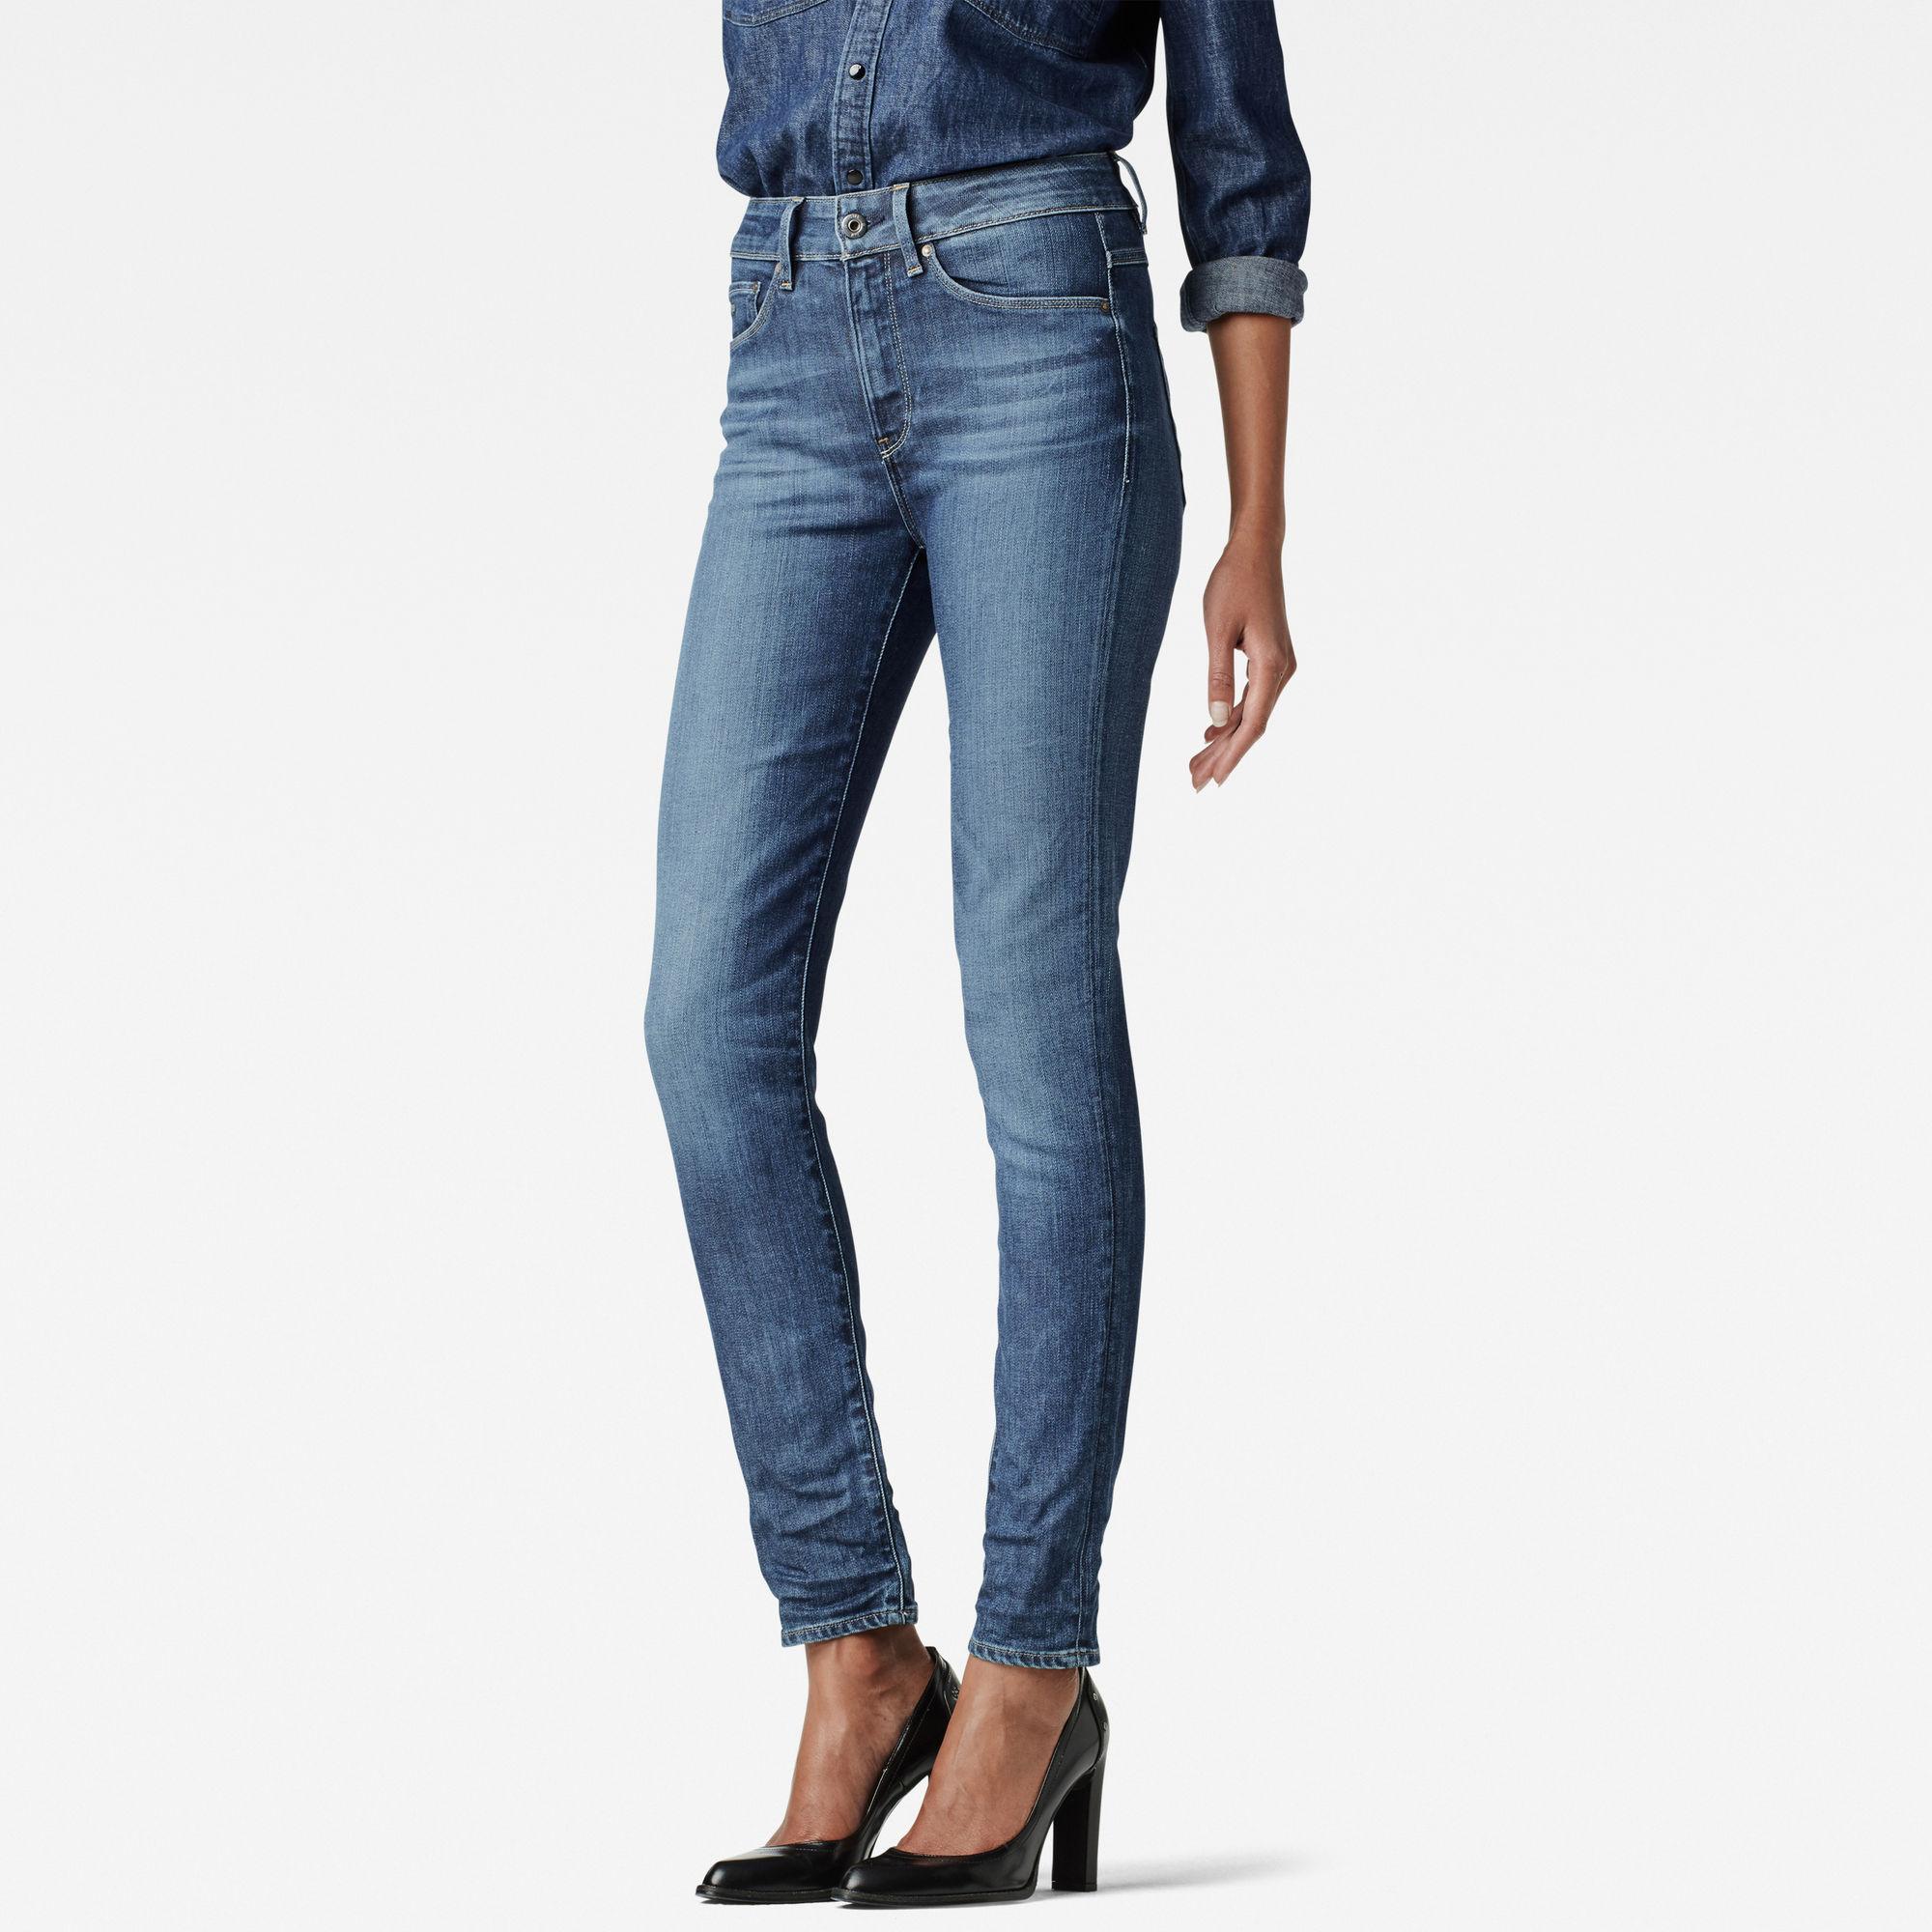 G-Star RAW Dames 3301 High Waist Skinny Jeans Donkerblauw